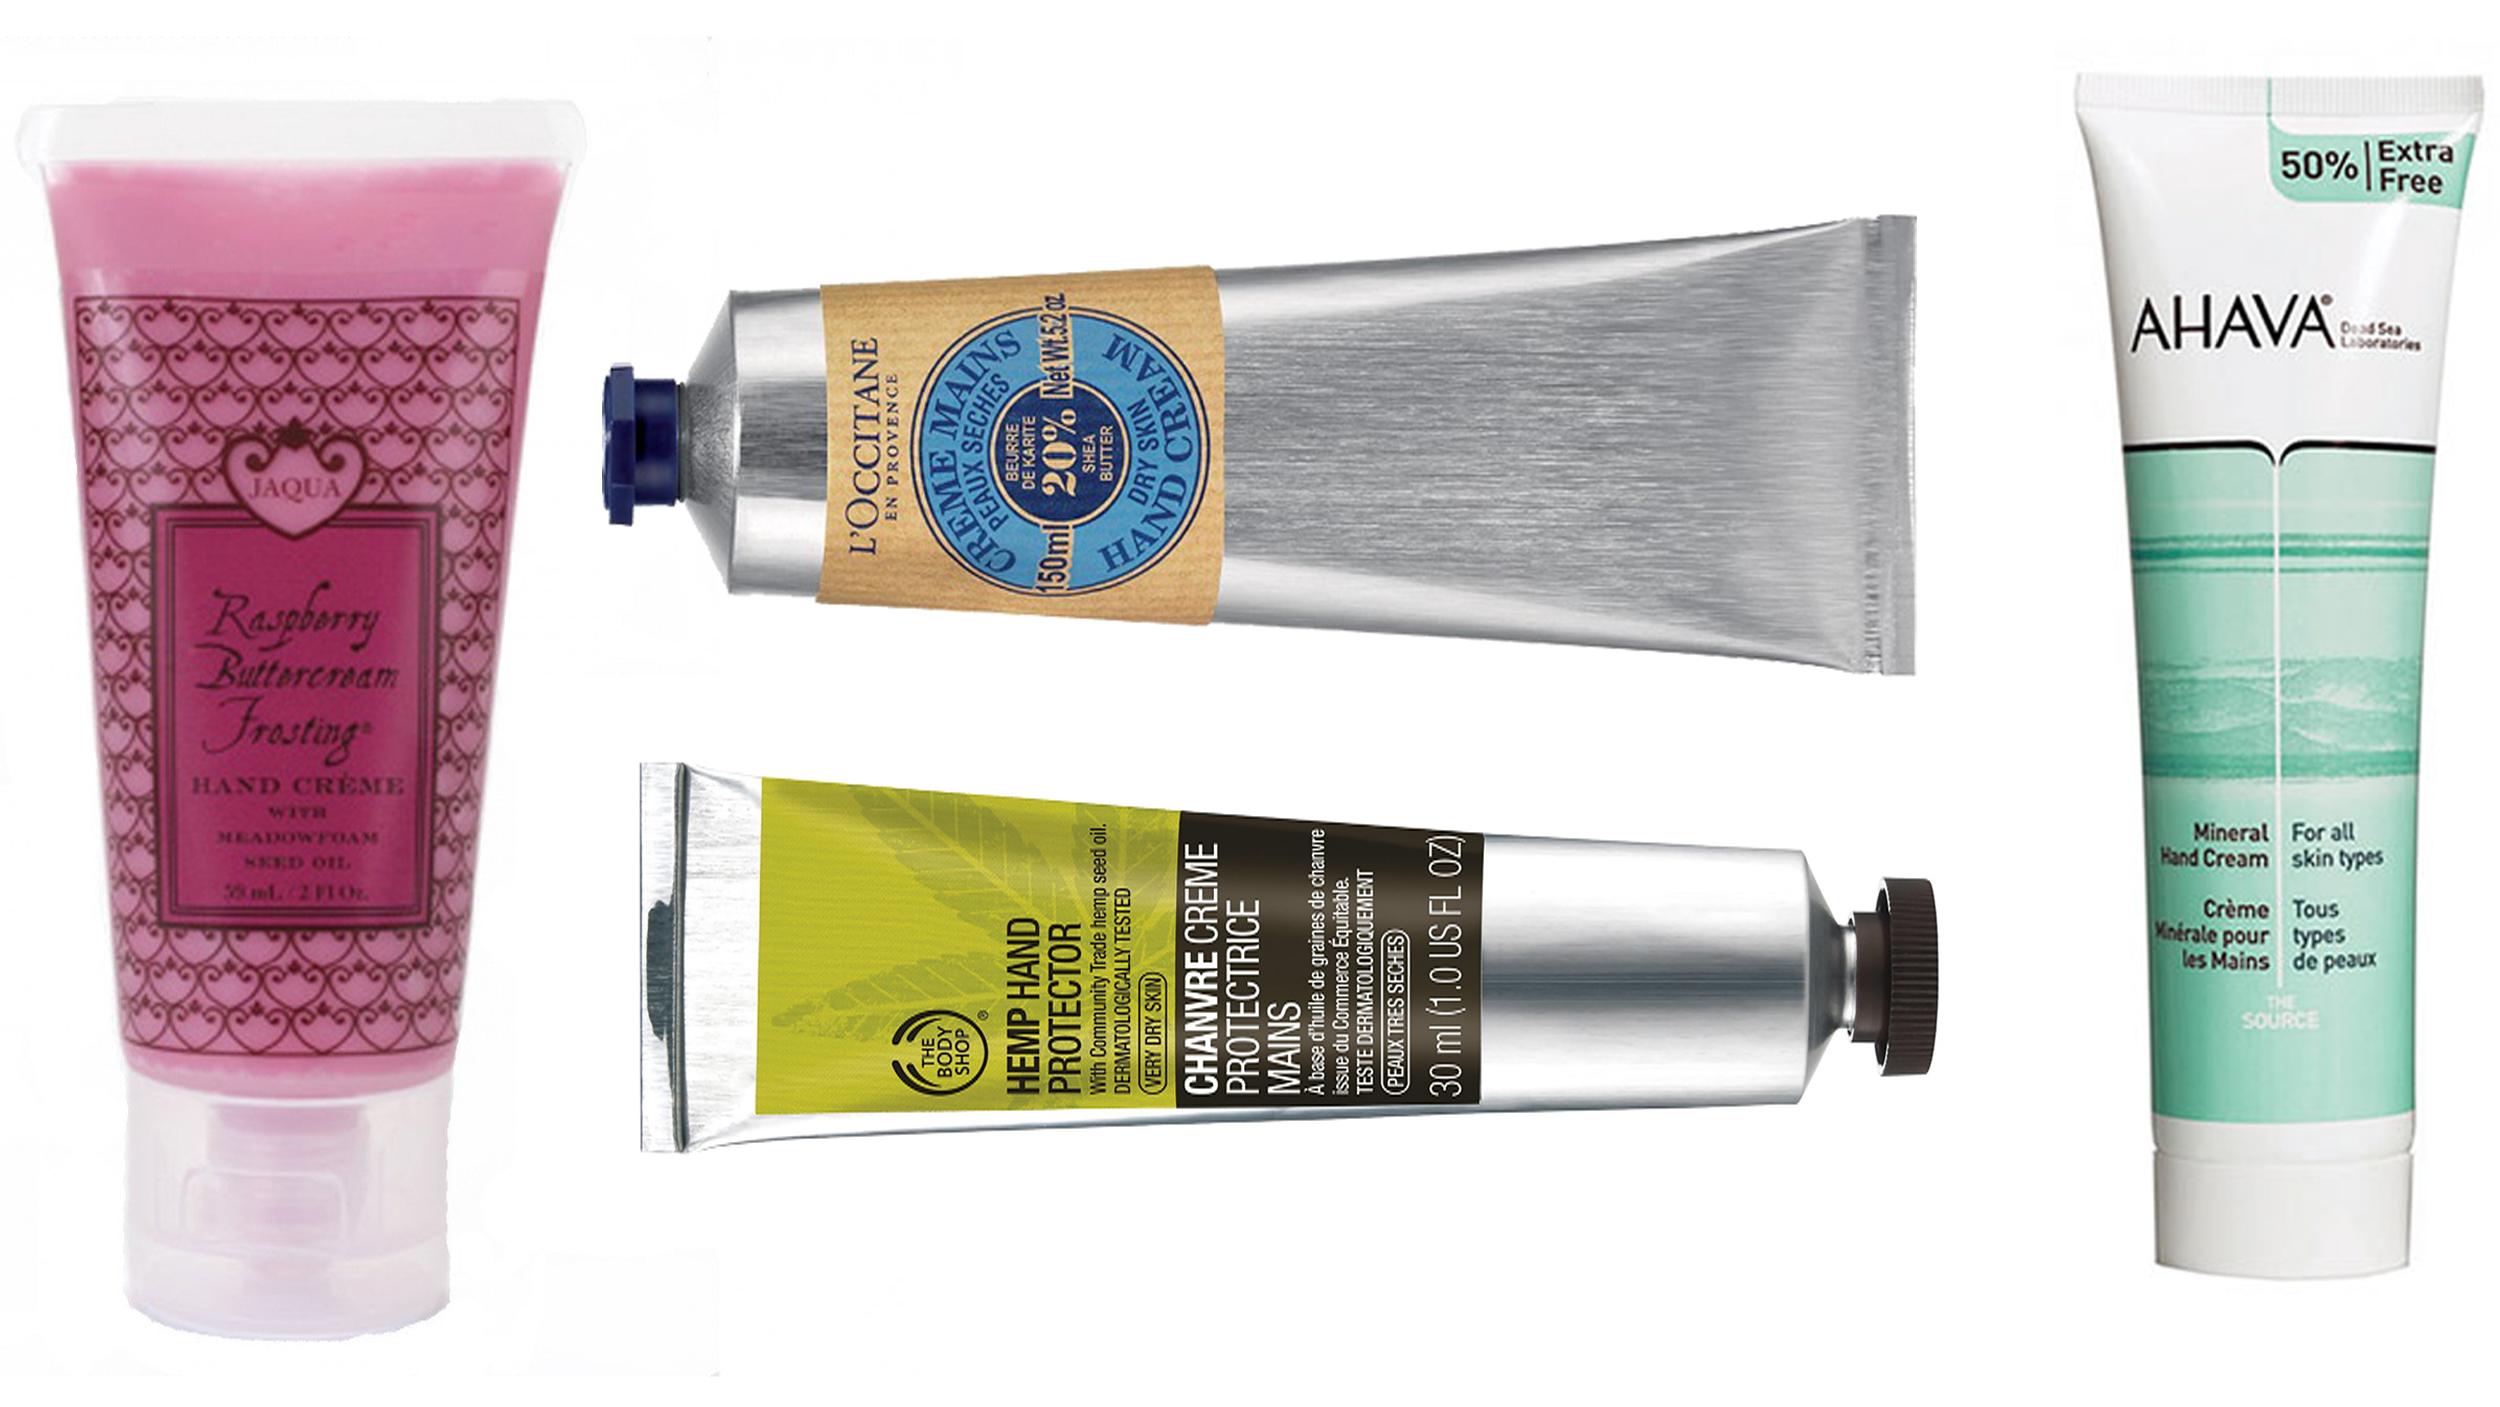 Soften Up! The 6 Best Hand Creams